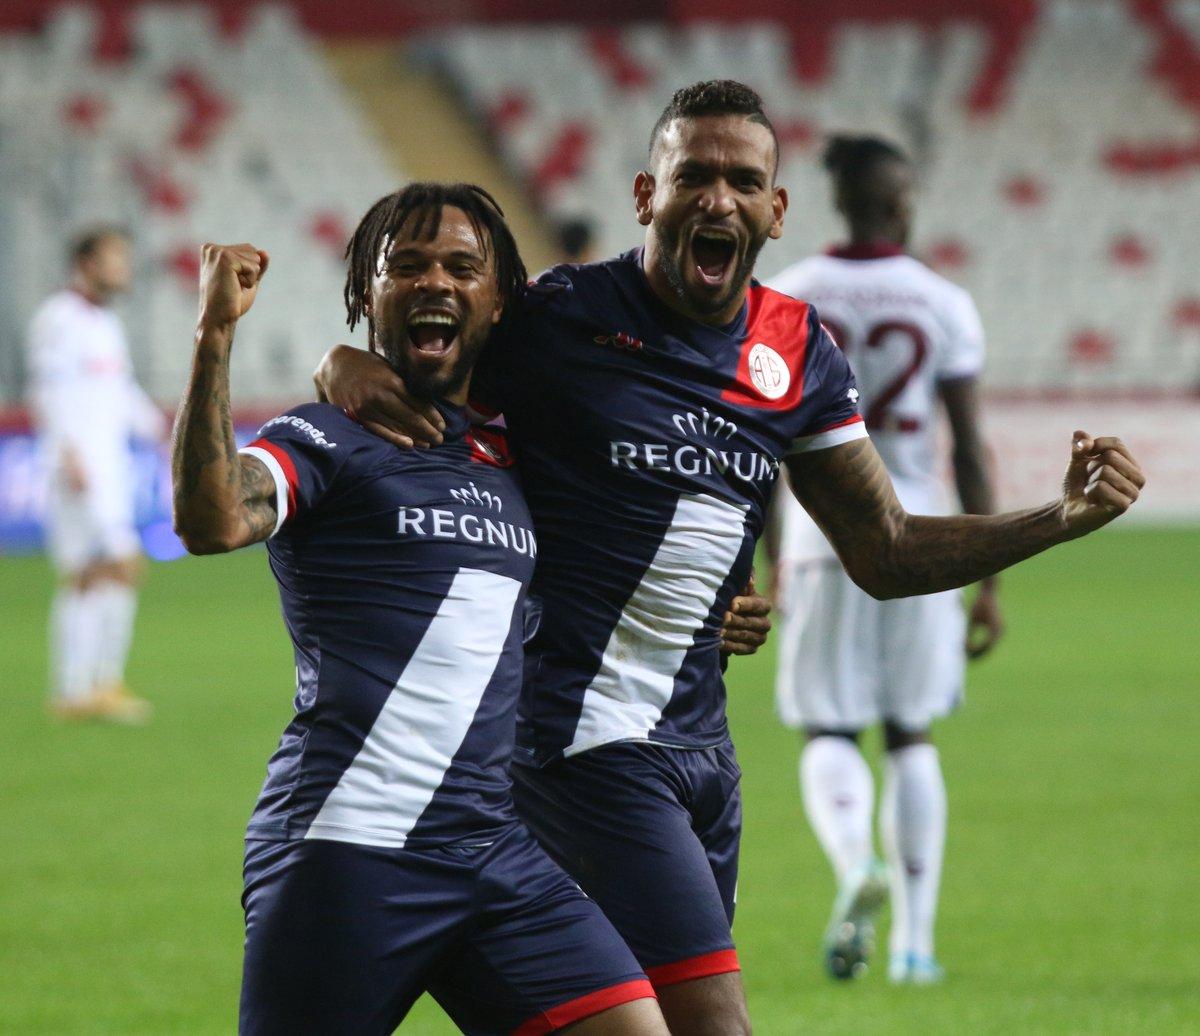 📸⚽👊 Gol anı!  Asist 👉 #FredyRibeiro, Gol 👉 #AmiltonMinervino